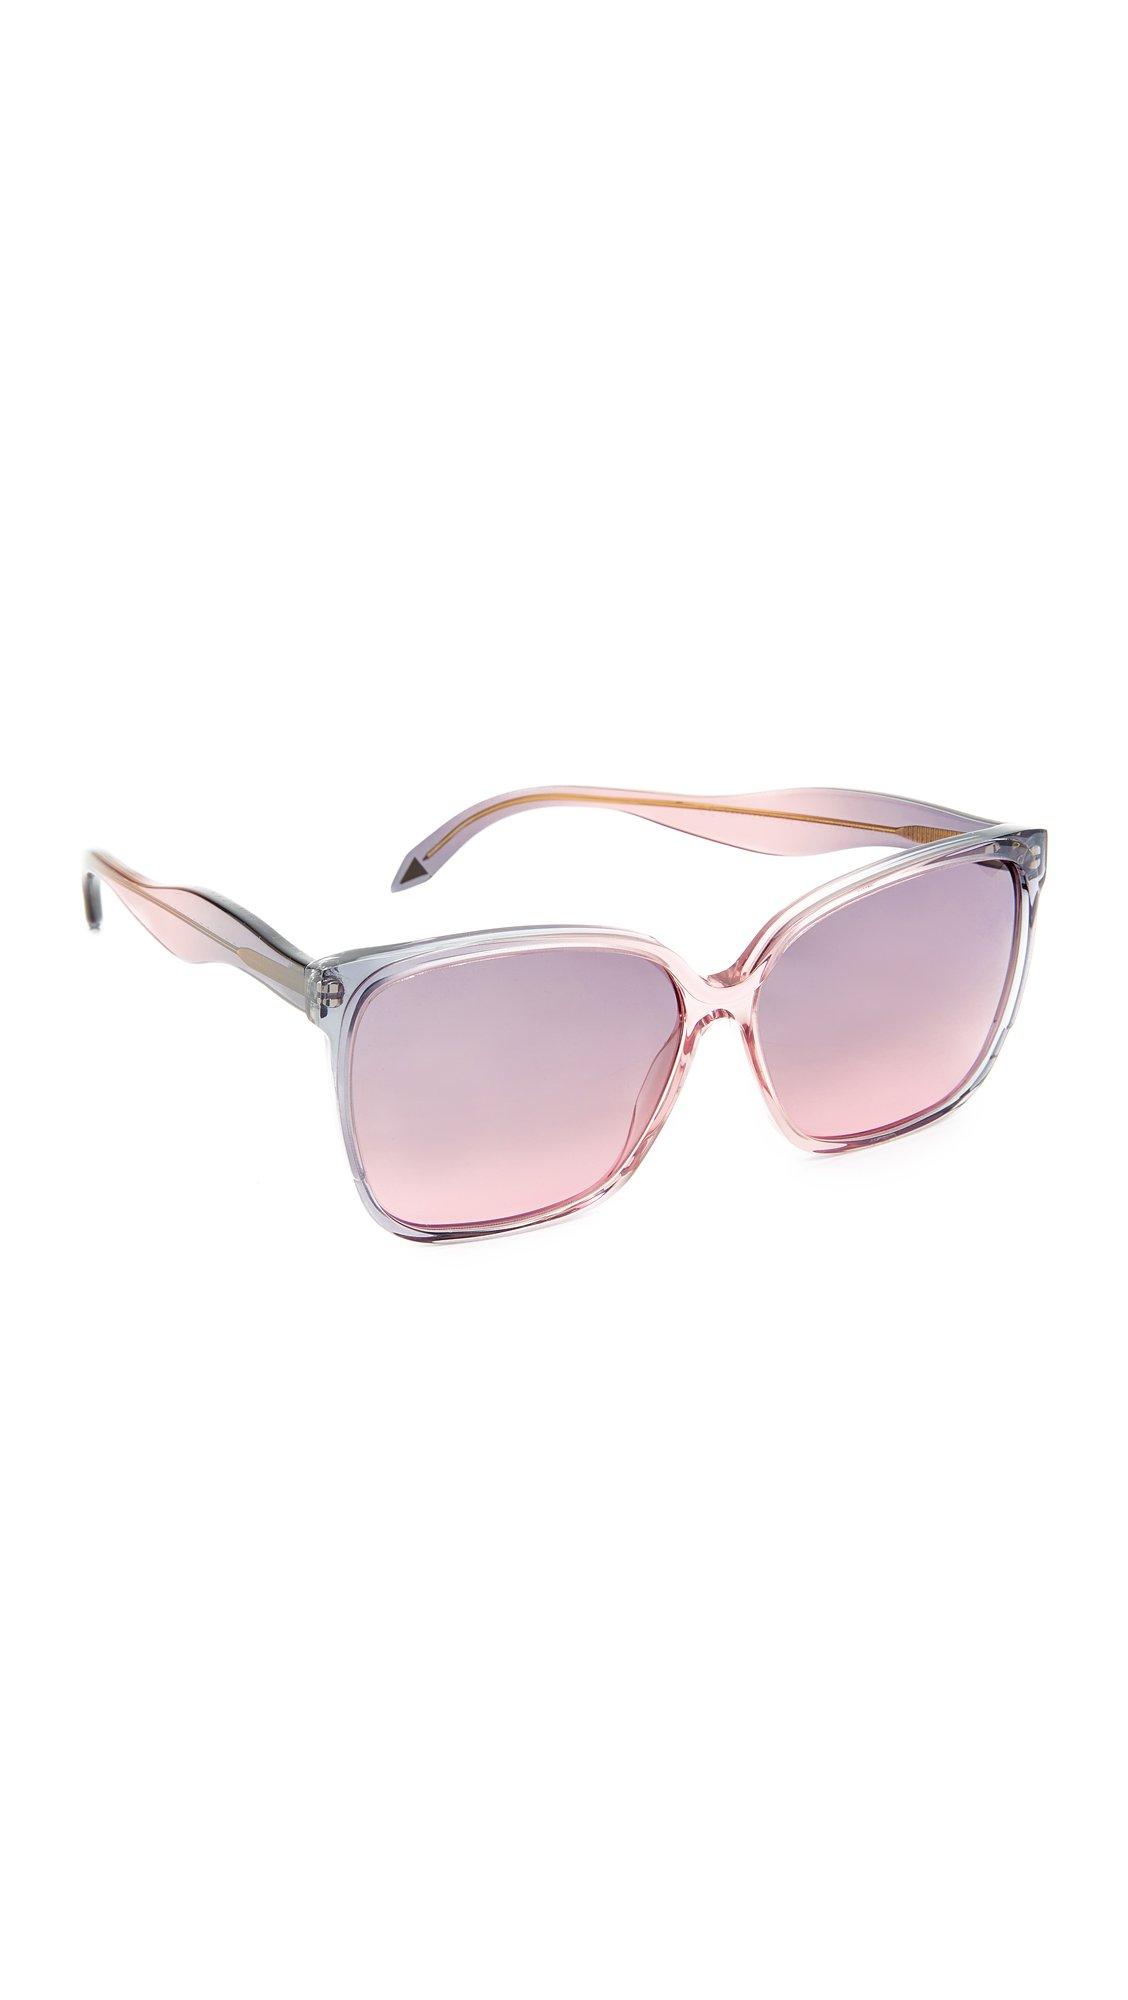 Victoria Beckham Women's Fine Square Wave Sunglasses, Wash Dove Pink/Purple, One Size